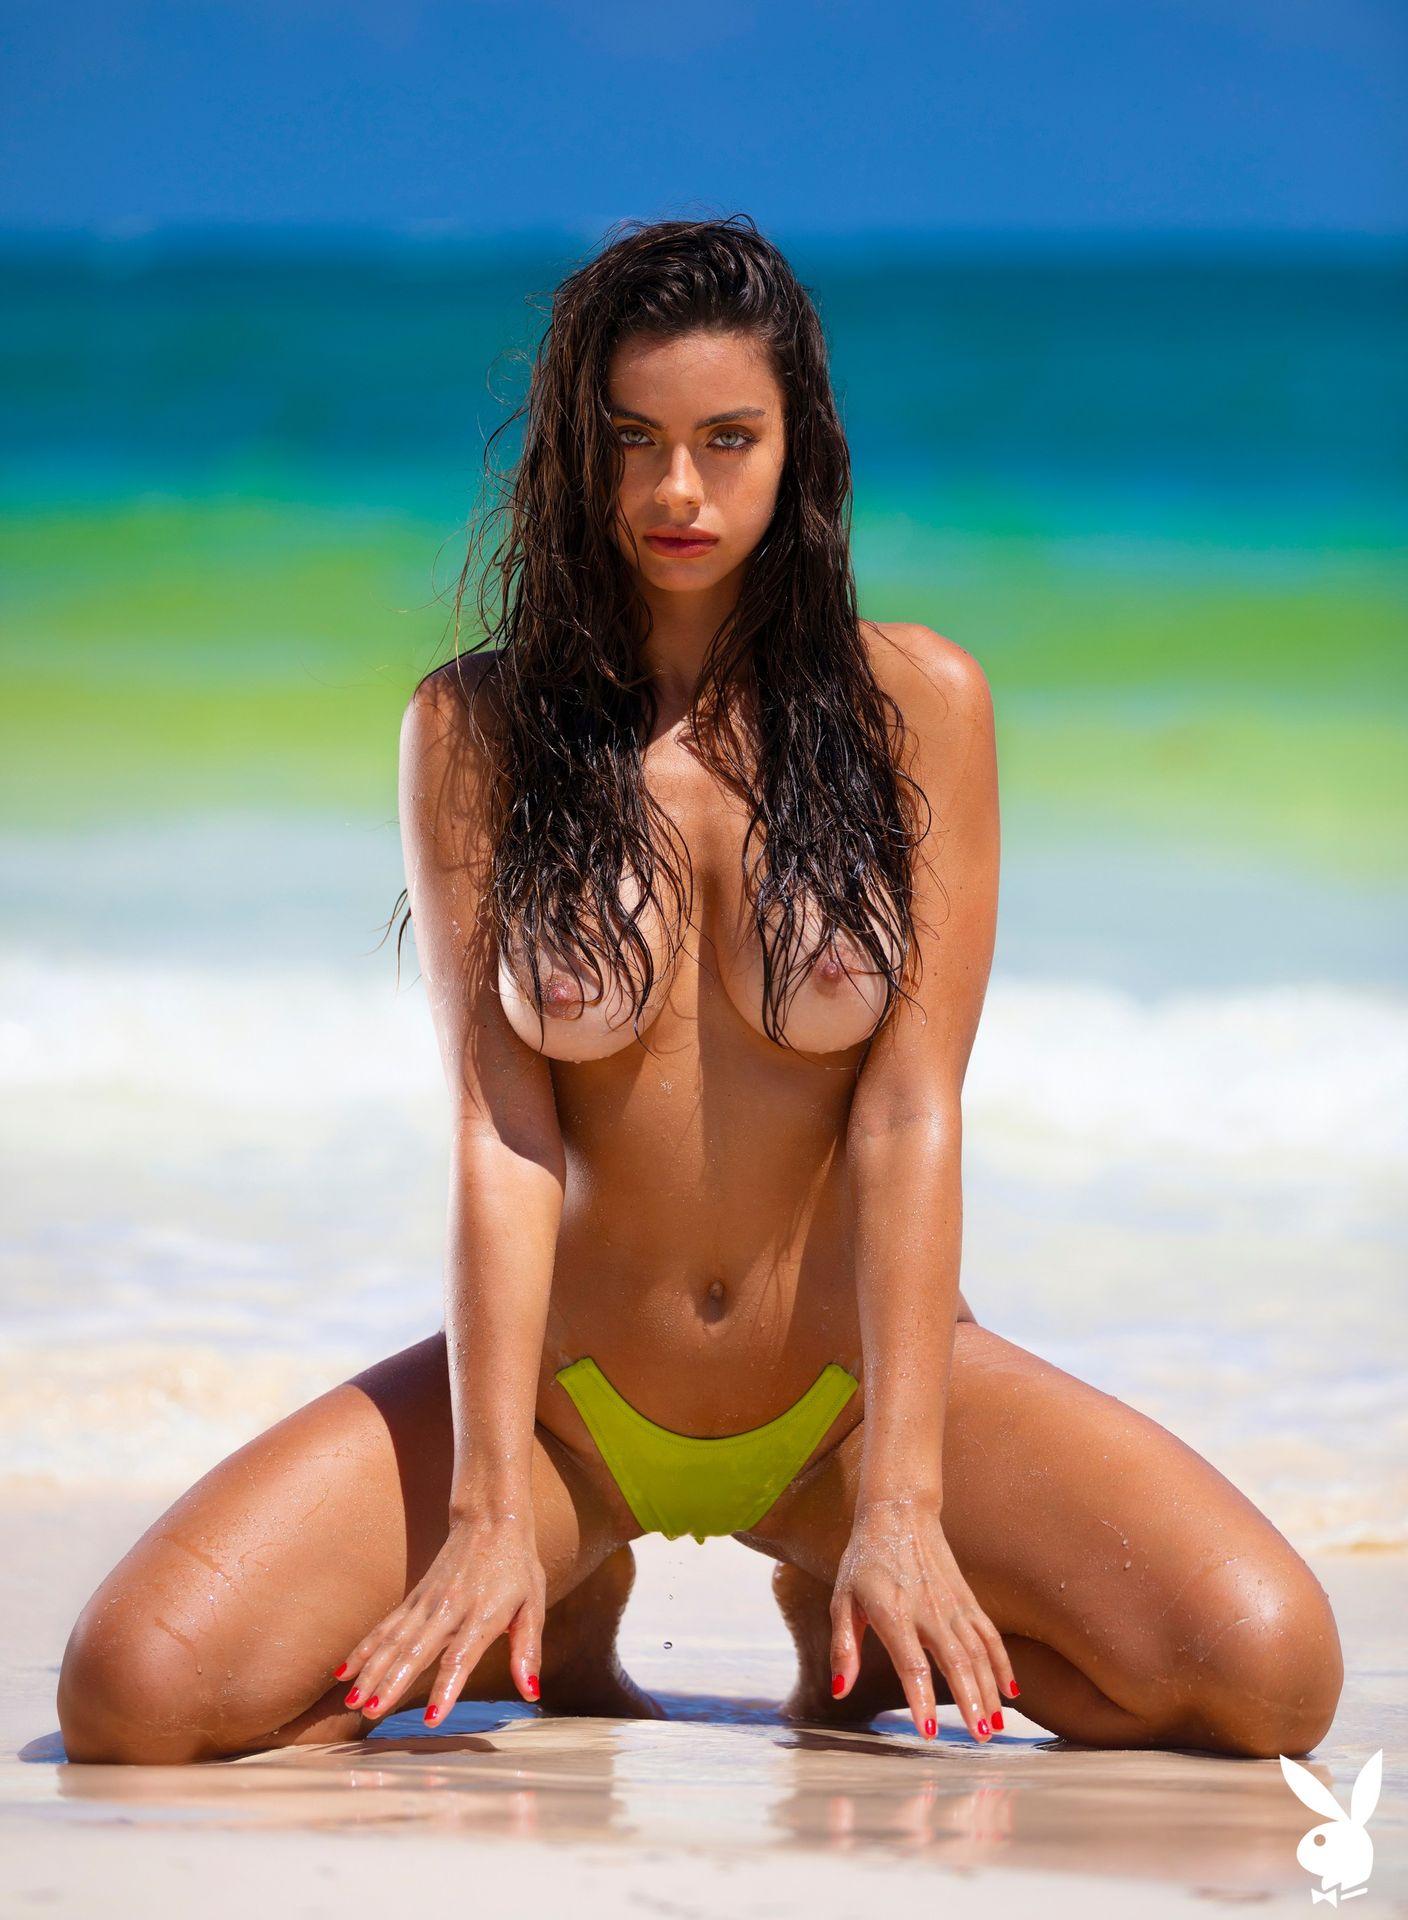 Priscilla-Huggings-Nude-The-Fappening-Blog-7